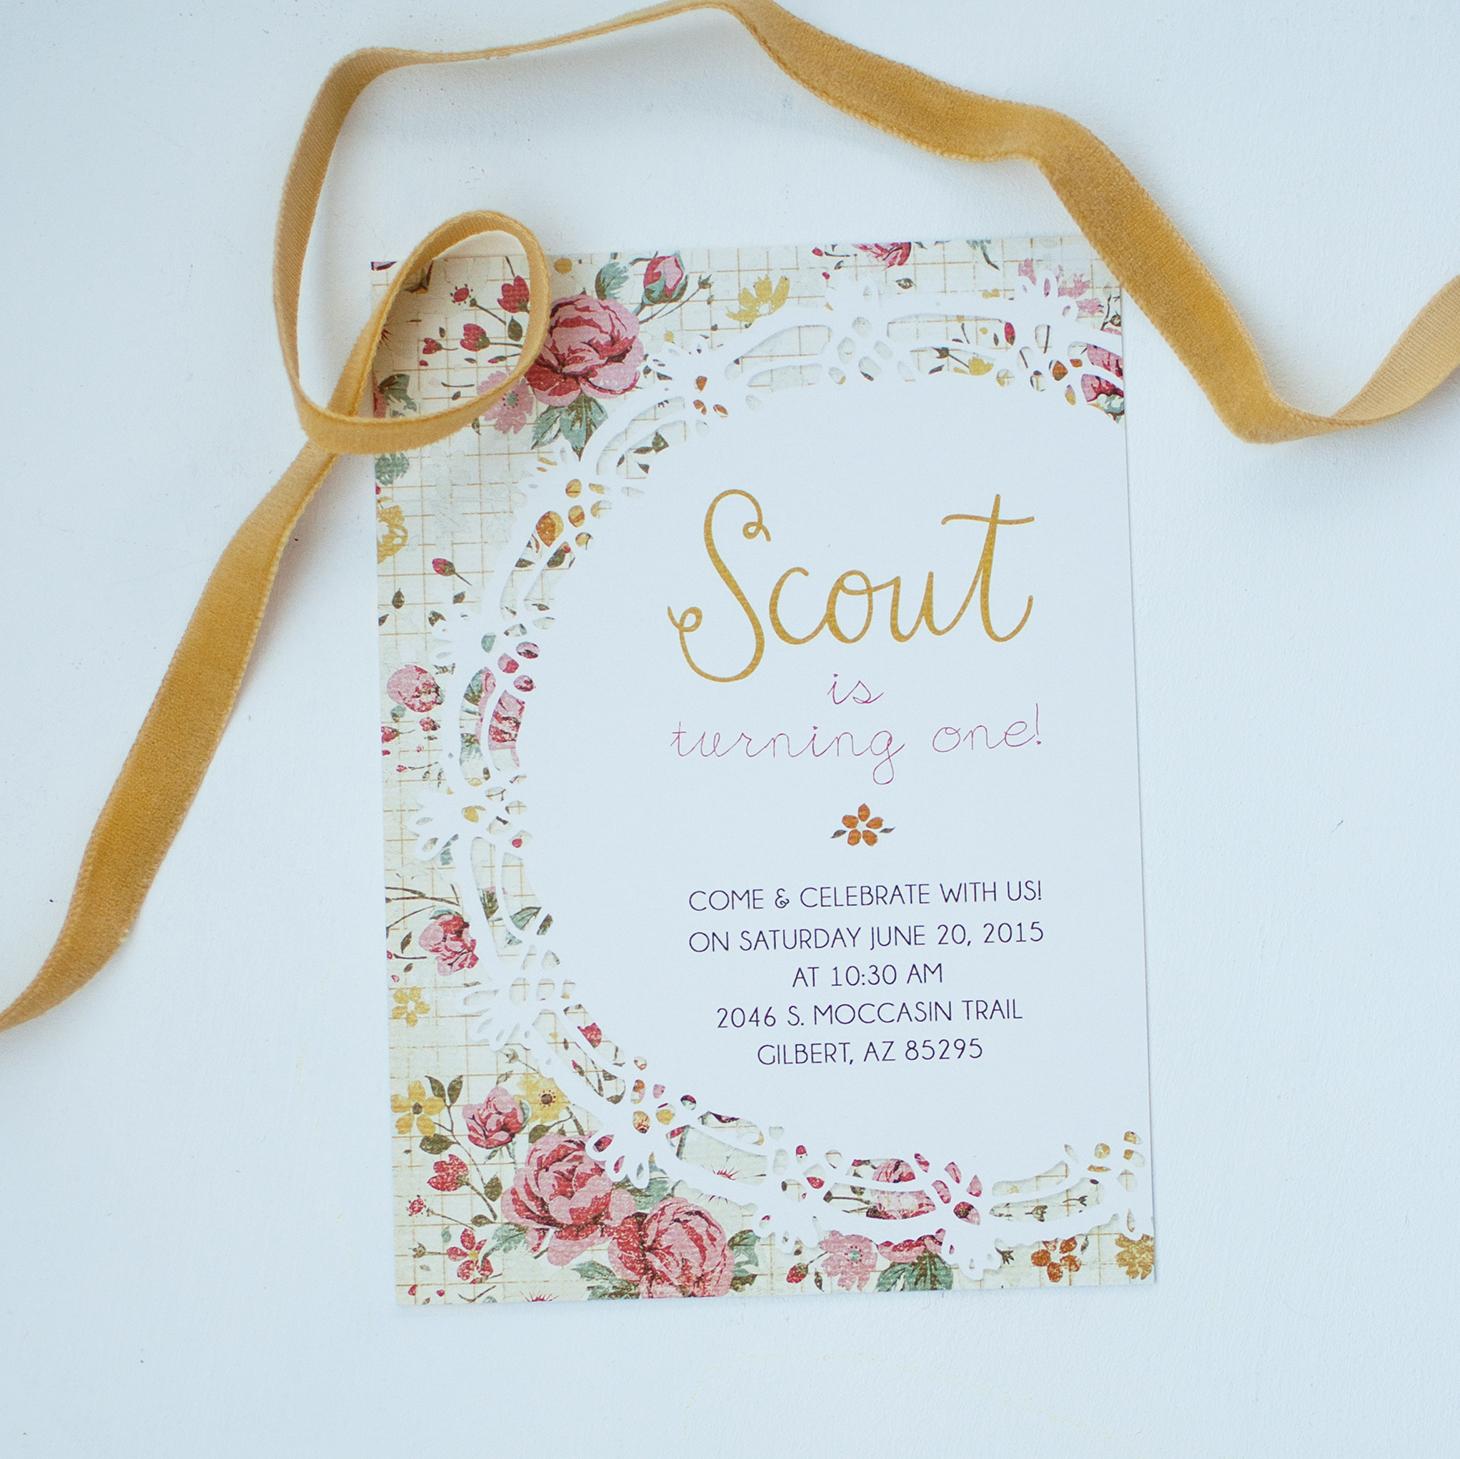 Sarah Garner Design, Graphic Design, Arizona, Print Design, Gilbert, Invitation Design, Invites